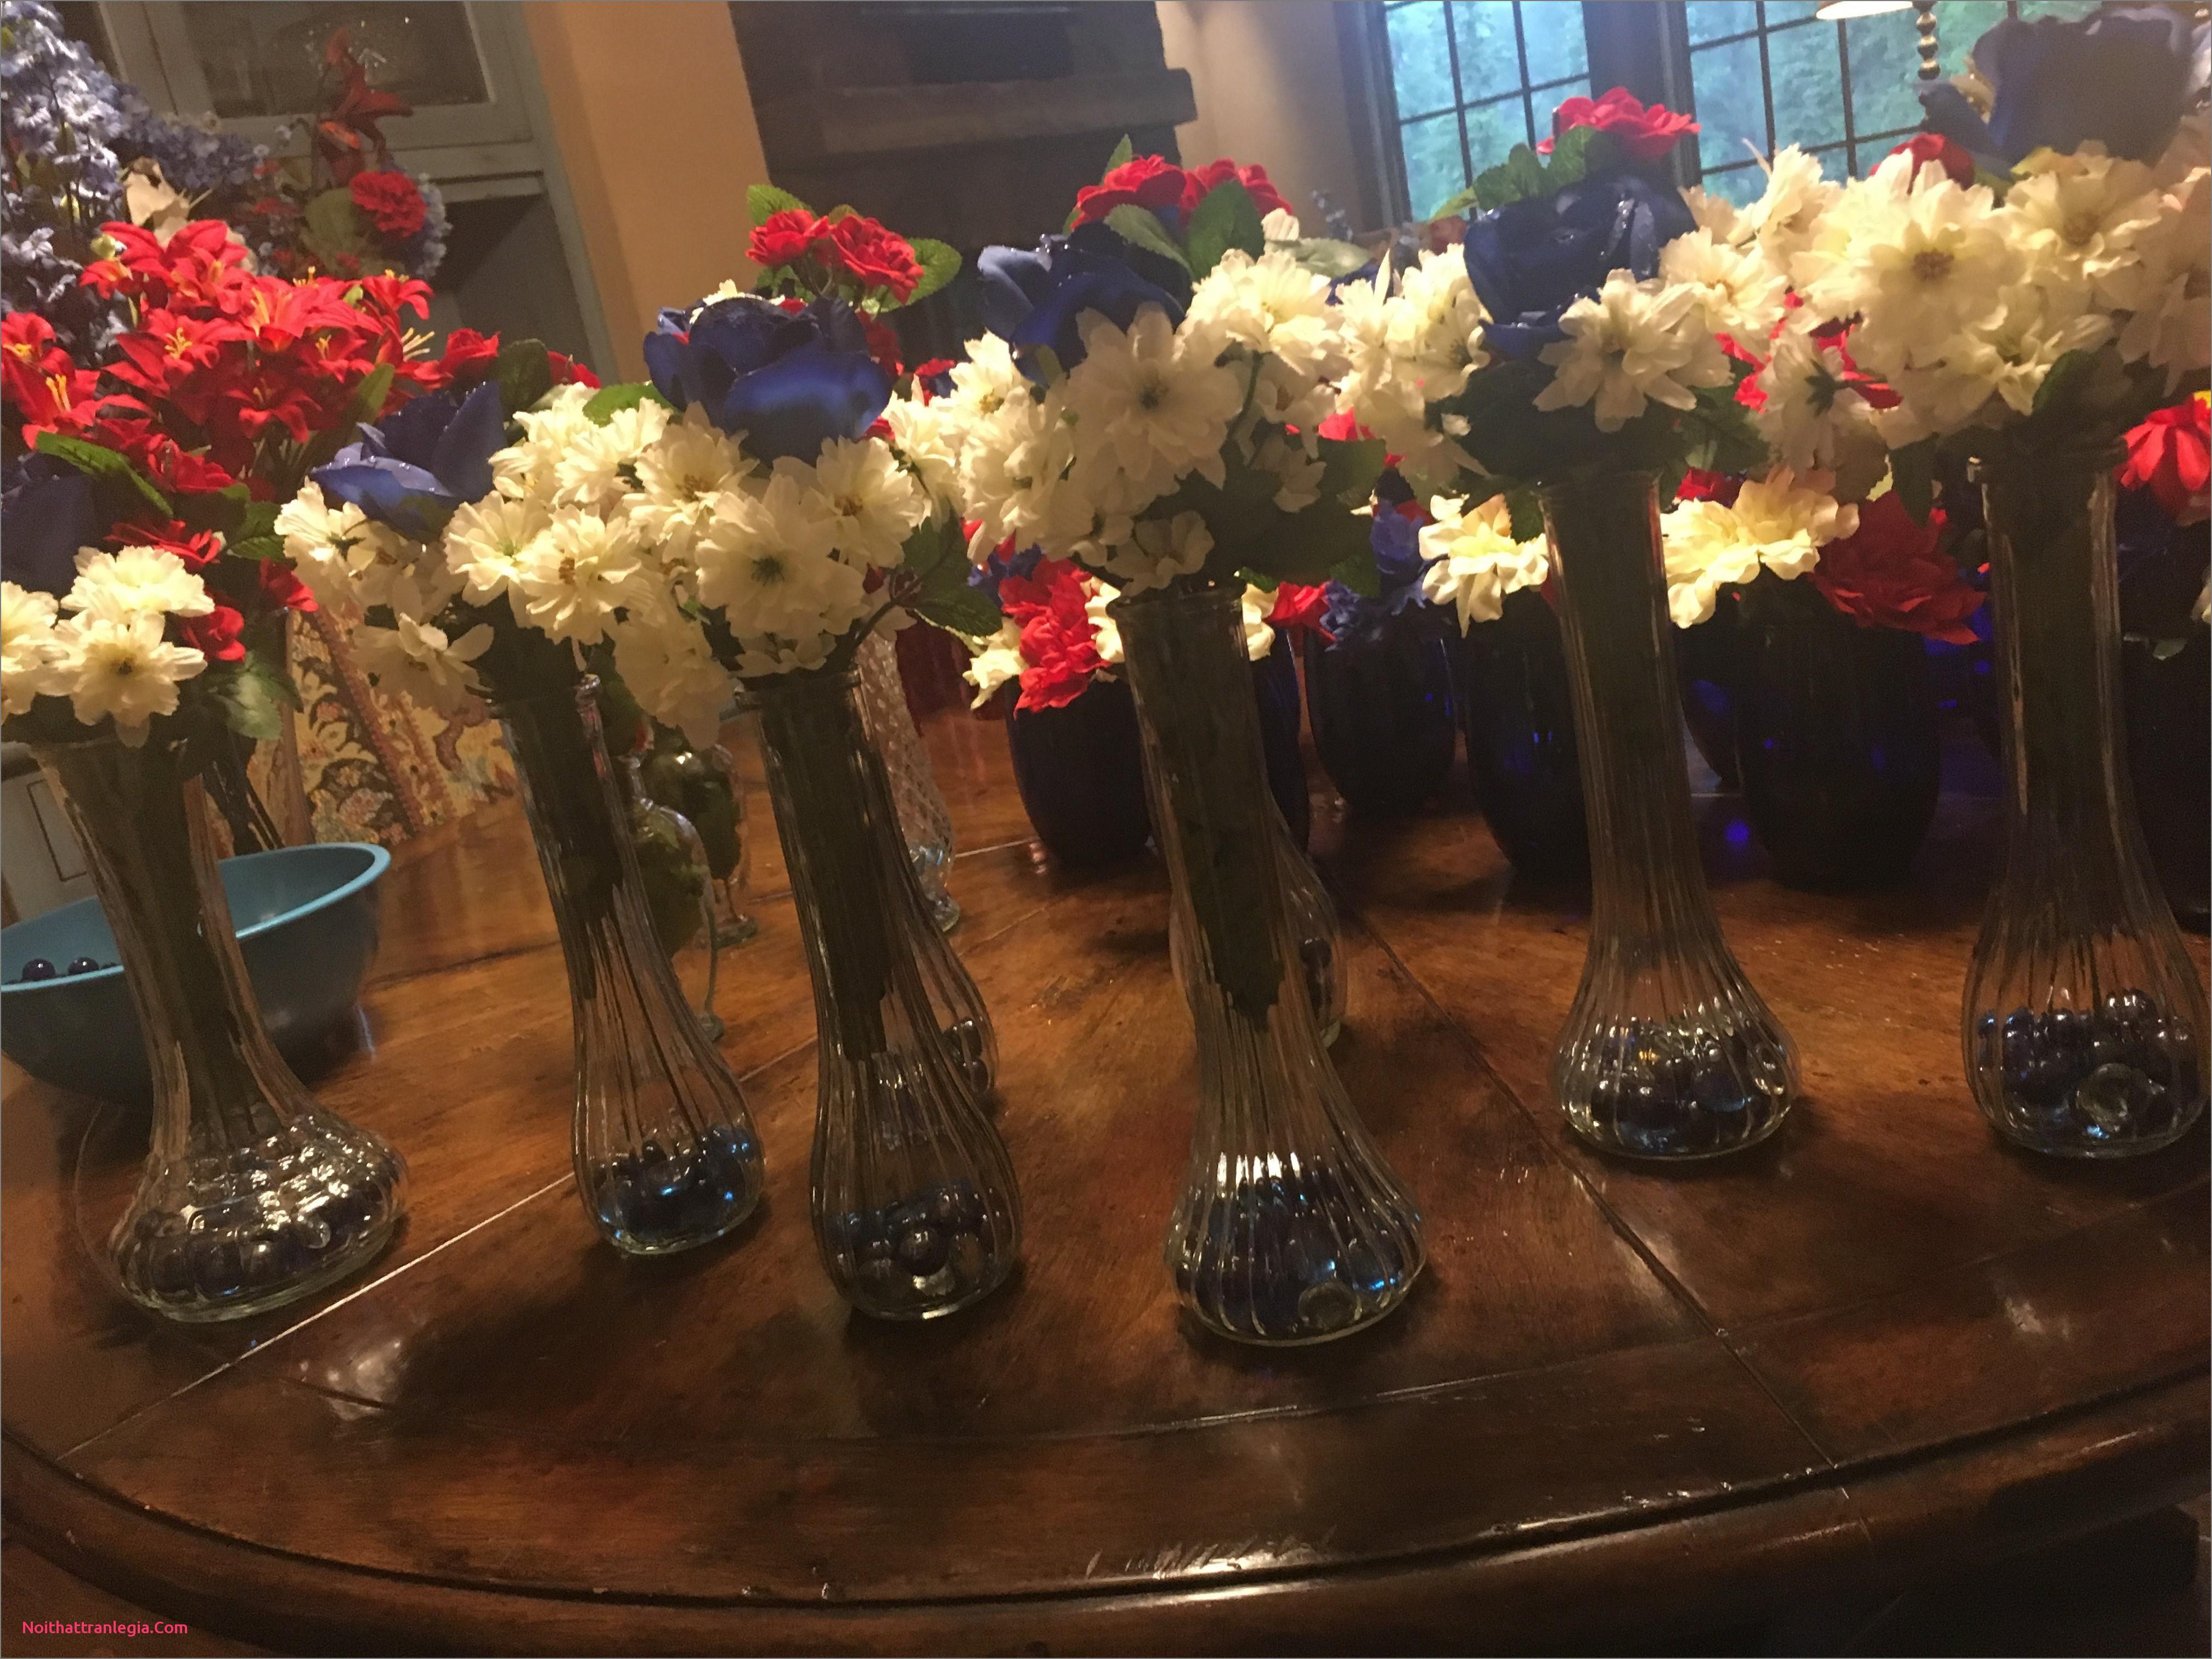 13 Wonderful Silver Vase Decor 2021 free download silver vase decor of 20 wedding vases noithattranlegia vases design in decoration line luxury dollar tree wedding decorations awesome h vases dollar vase i 0d